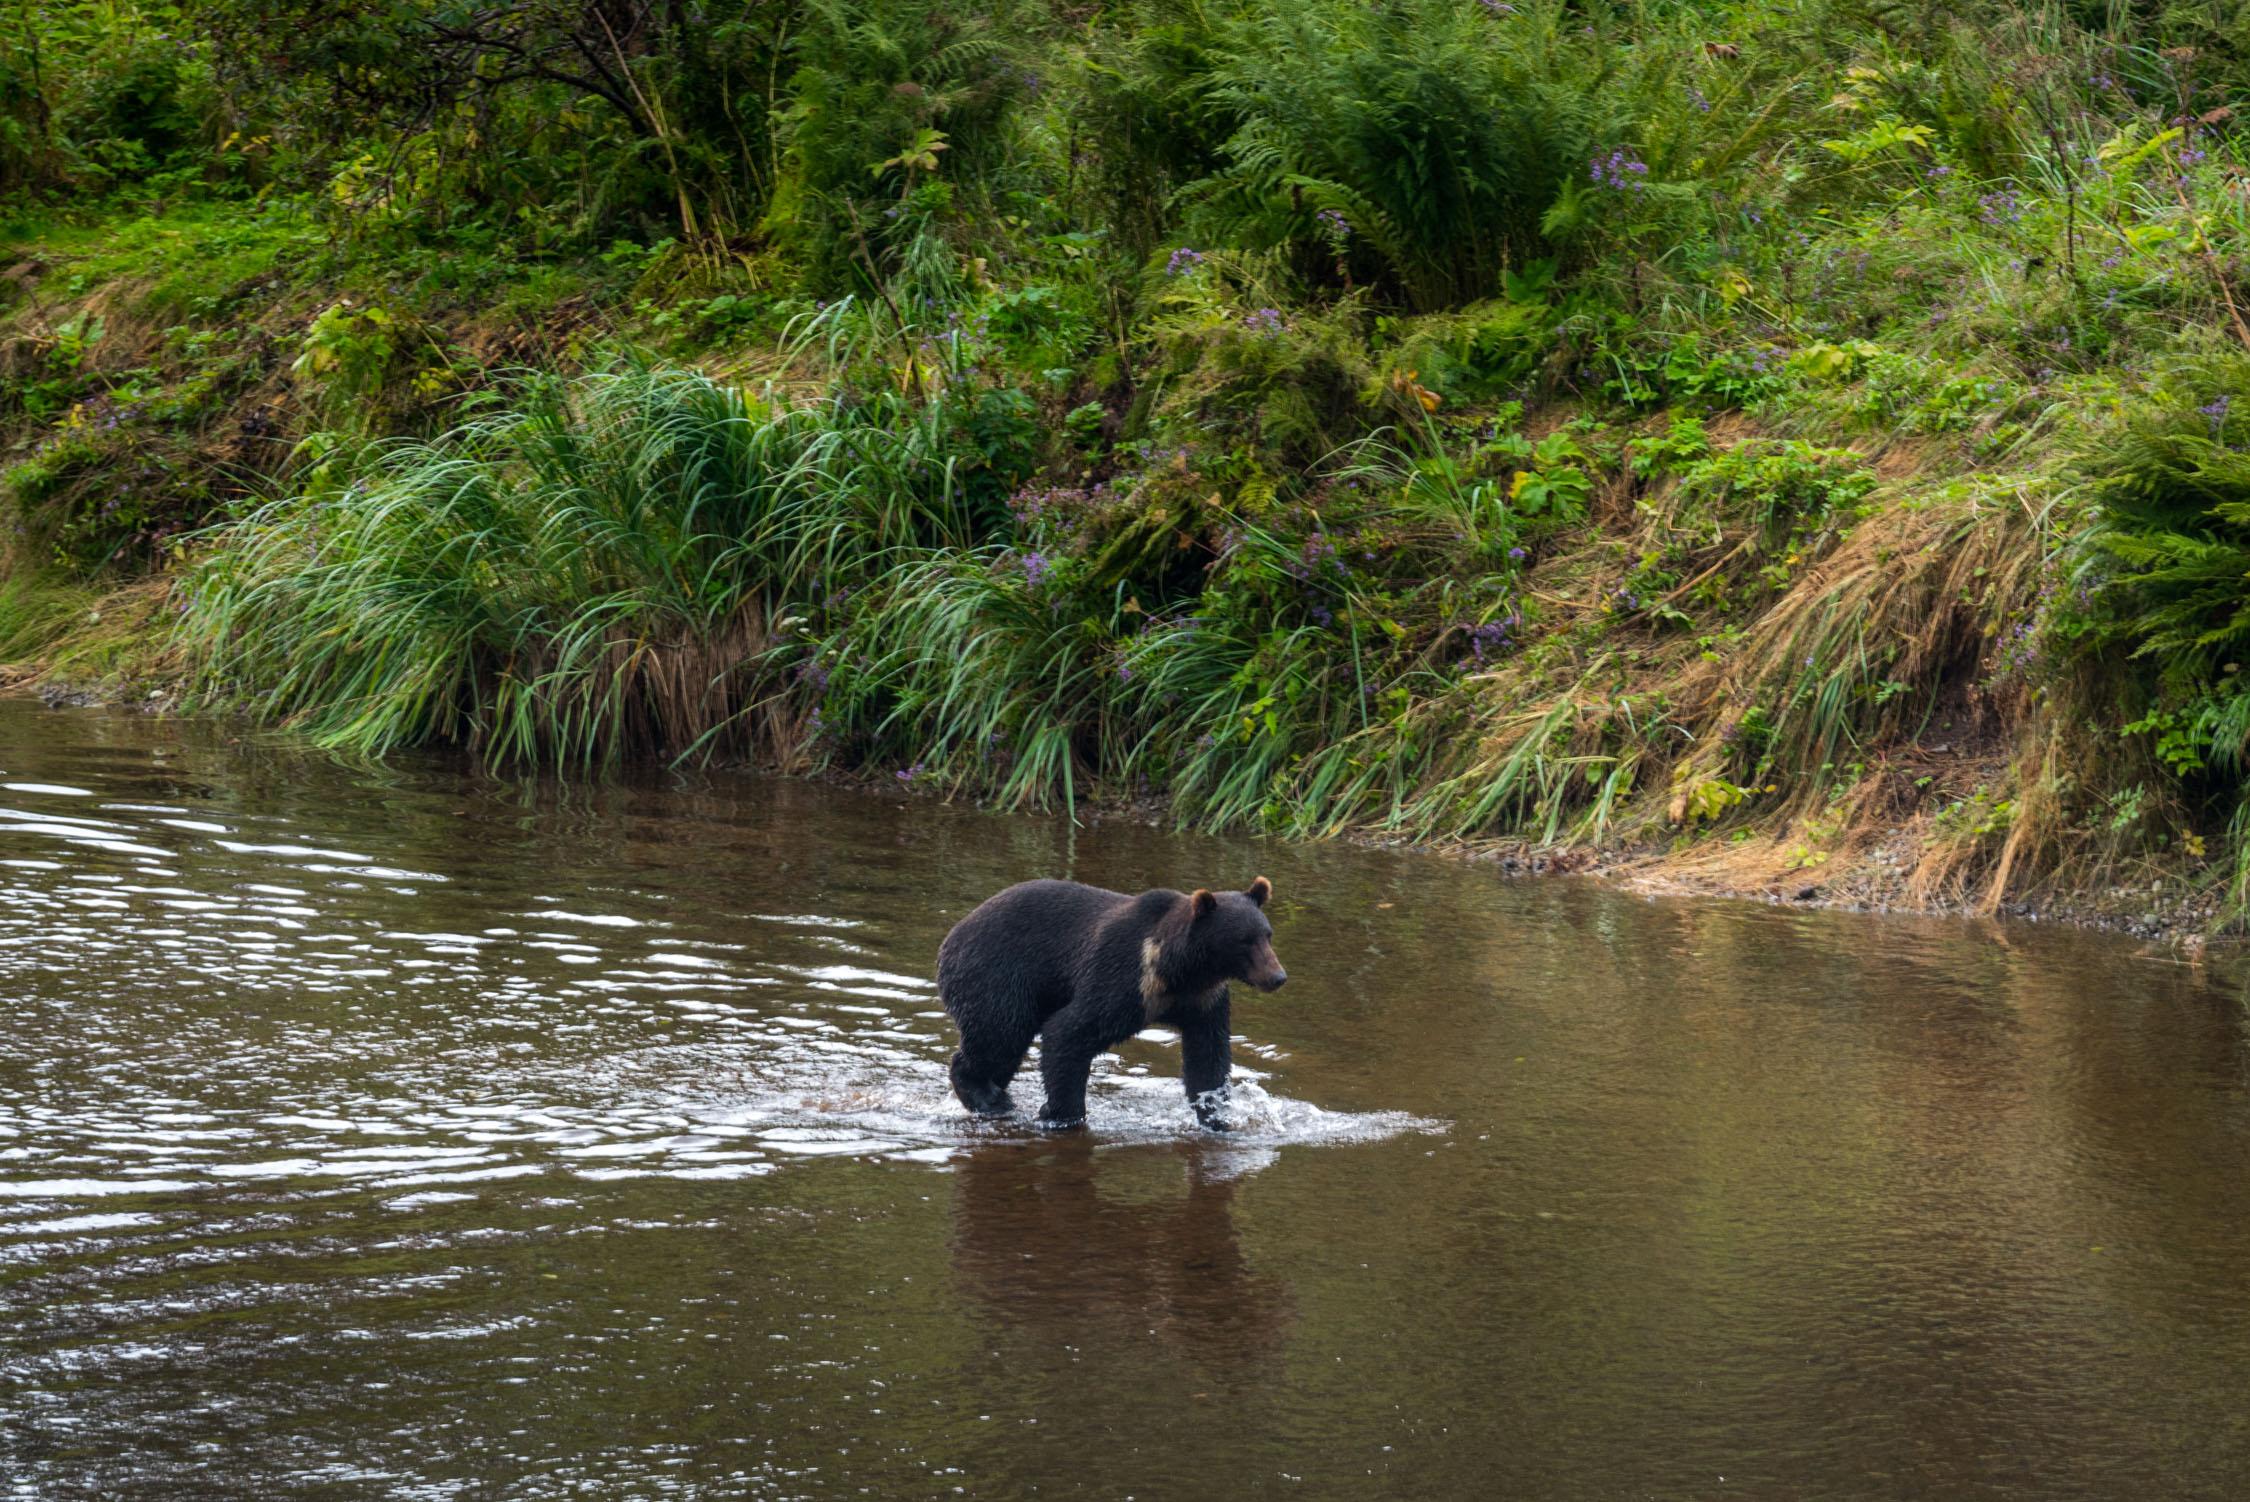 Searching for bears in Hoonah, Alaska